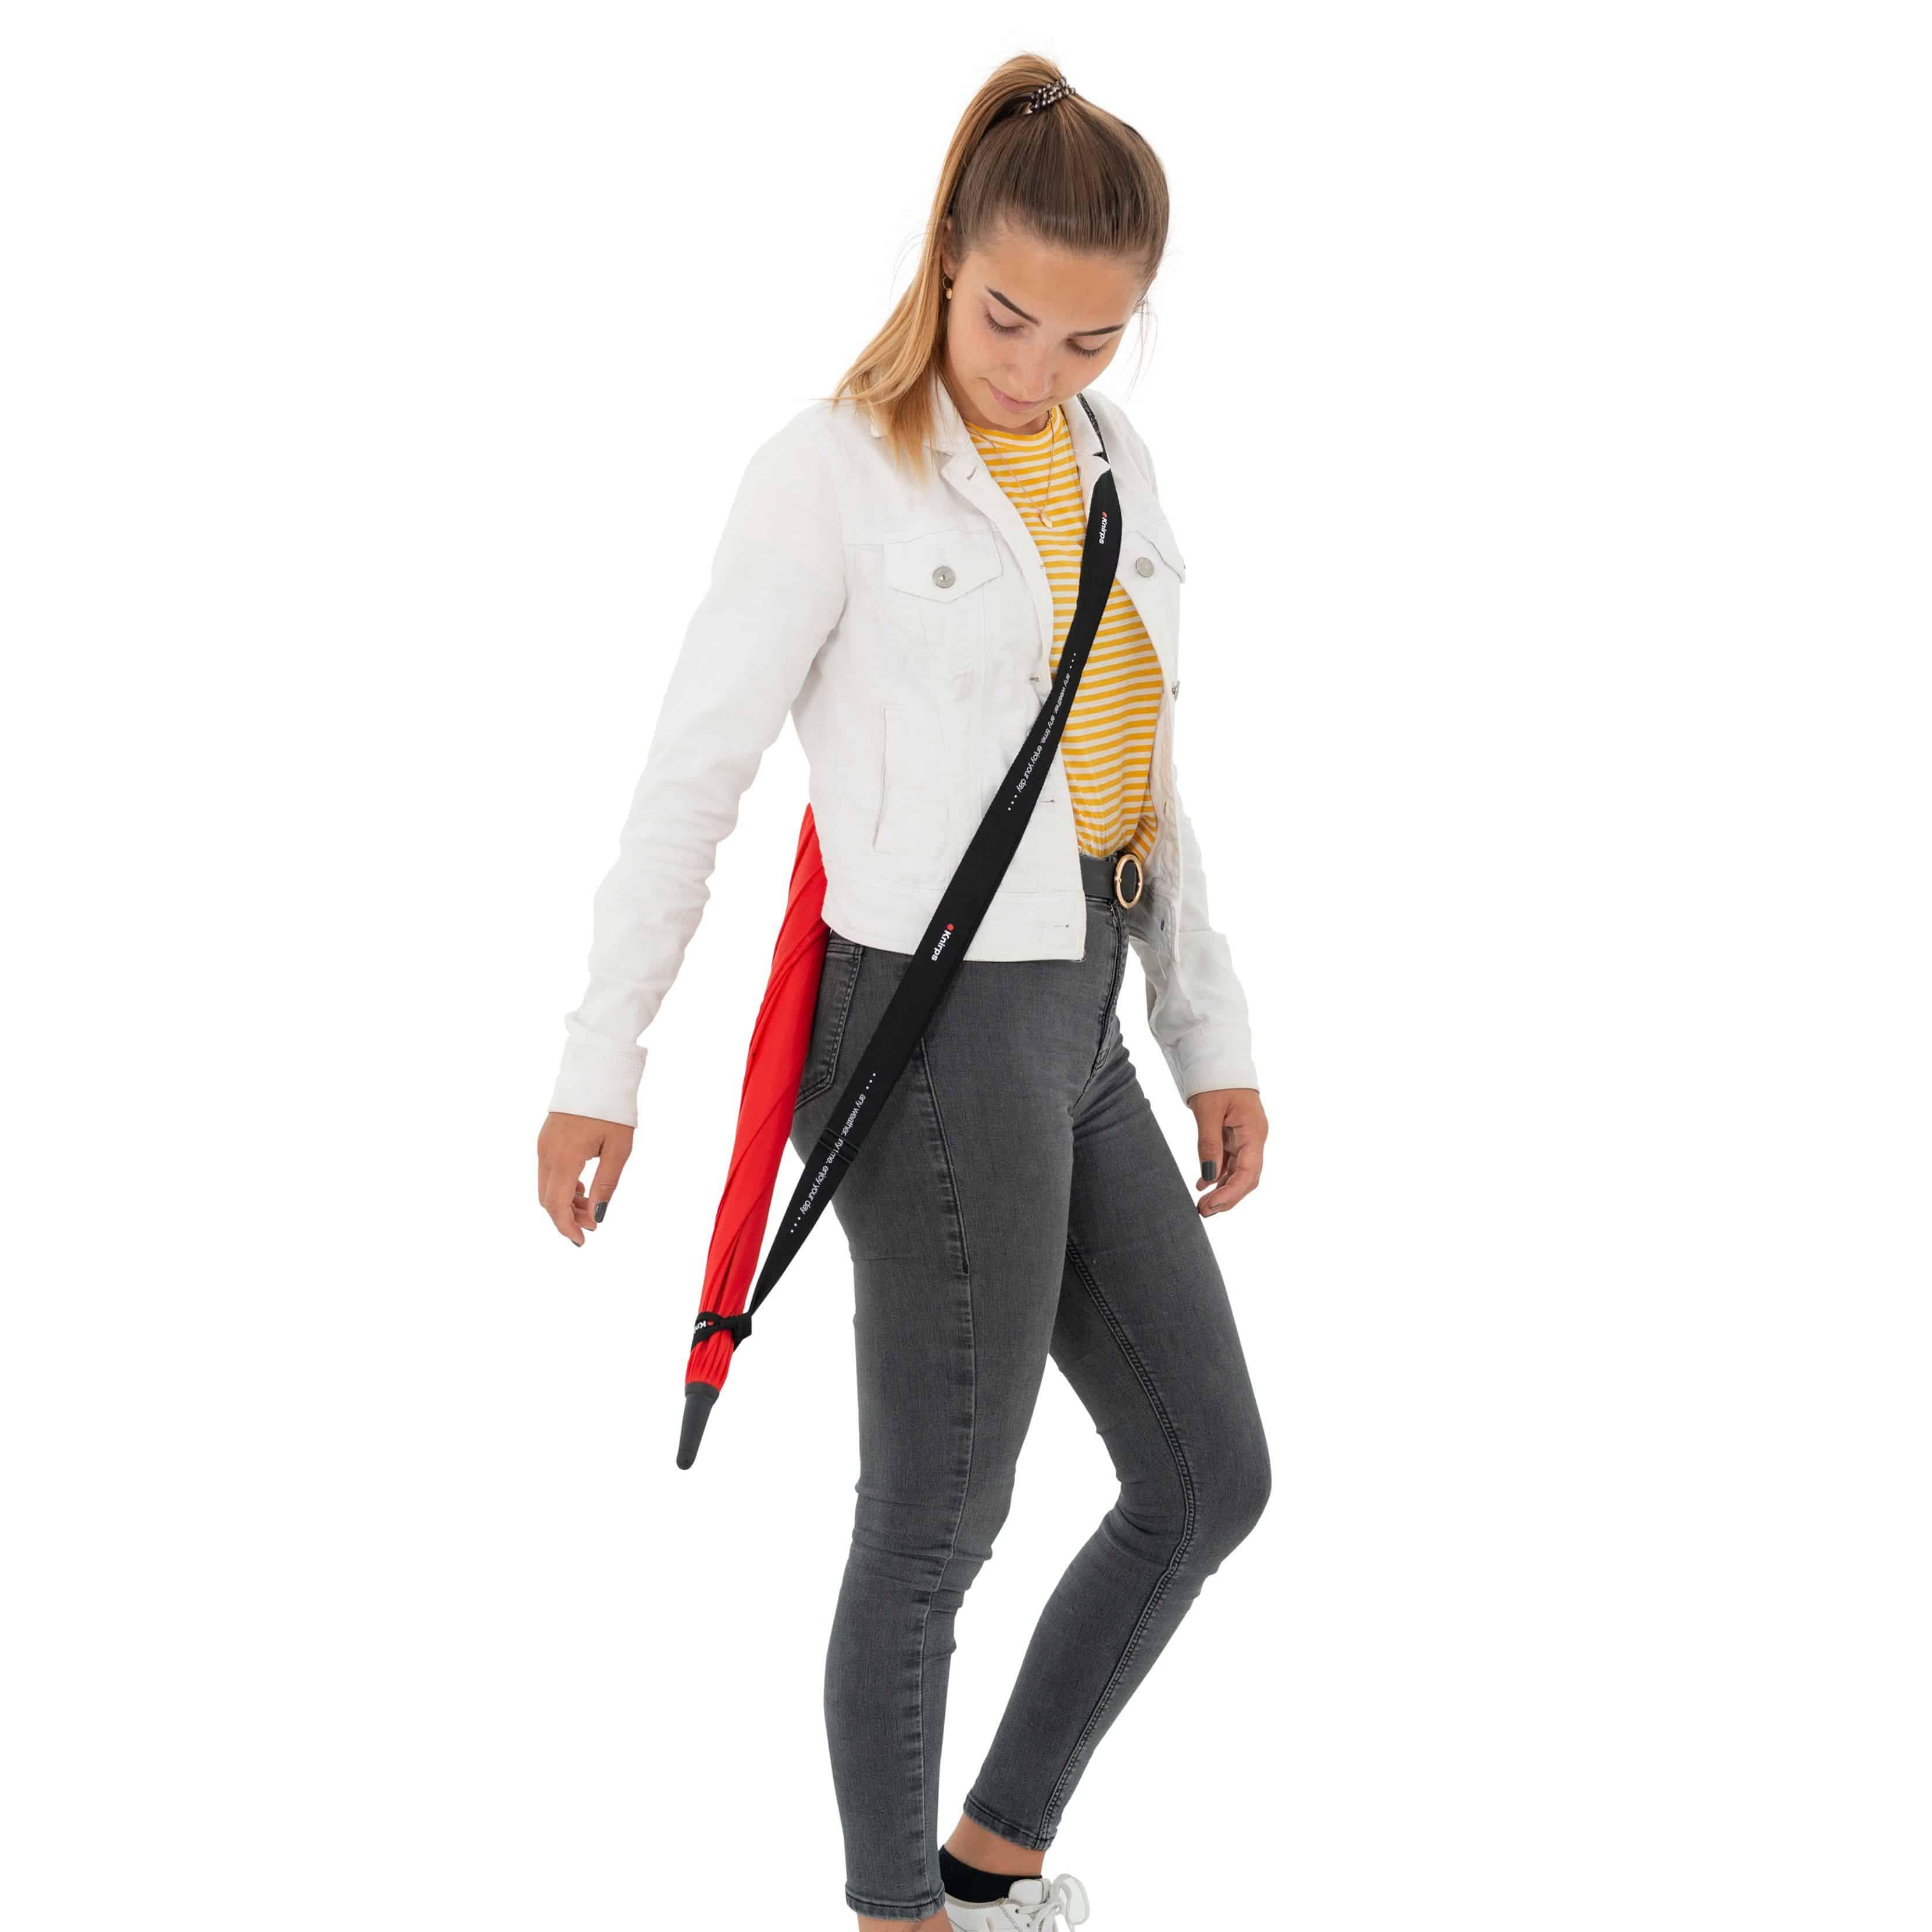 Knirps Rainwear Accessoires Umbrella2Go Flex - photo 4